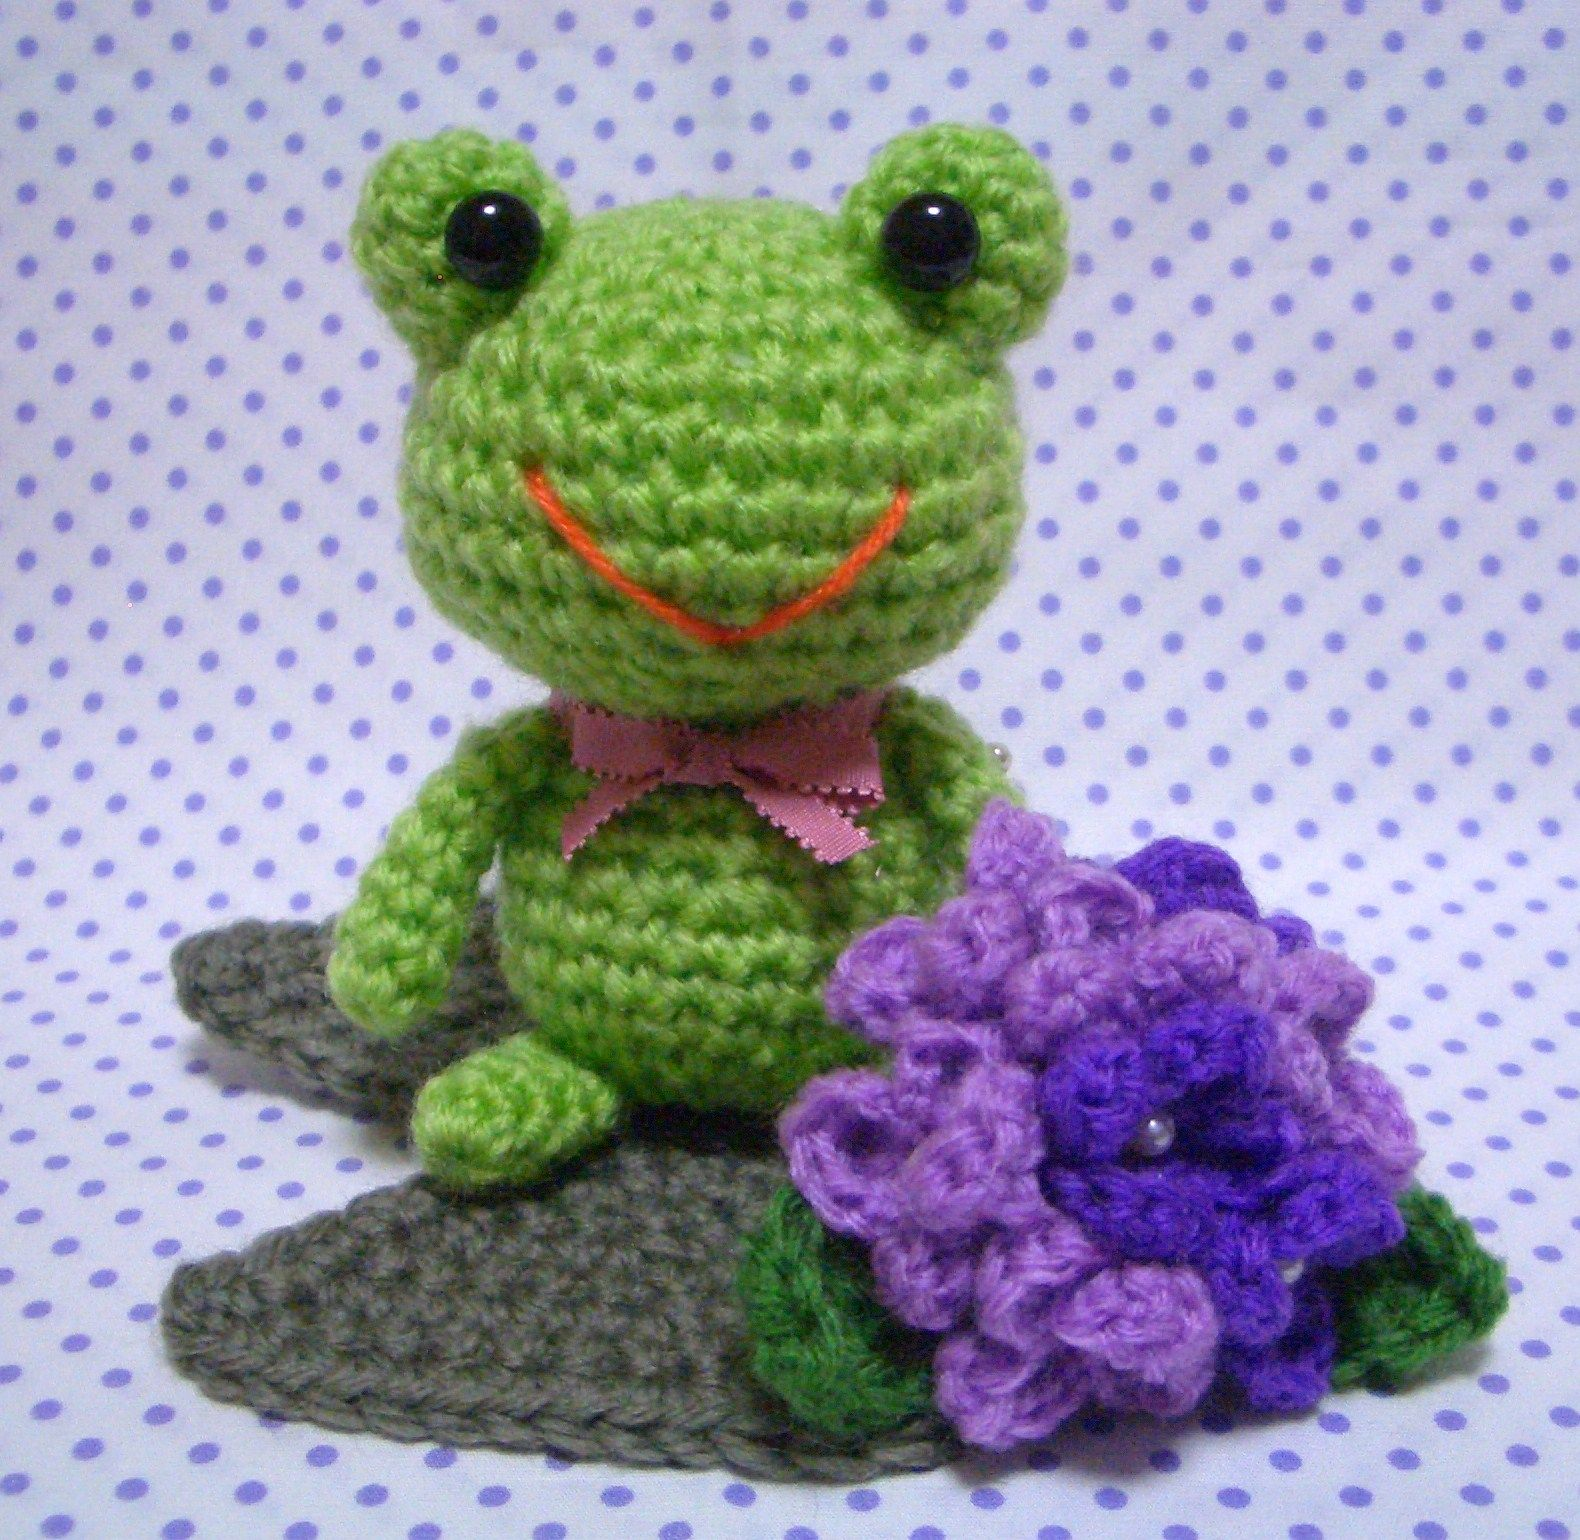 yahoo ブログ サービス終了 あみぐるみ 編み図 編み物 小物 手編み